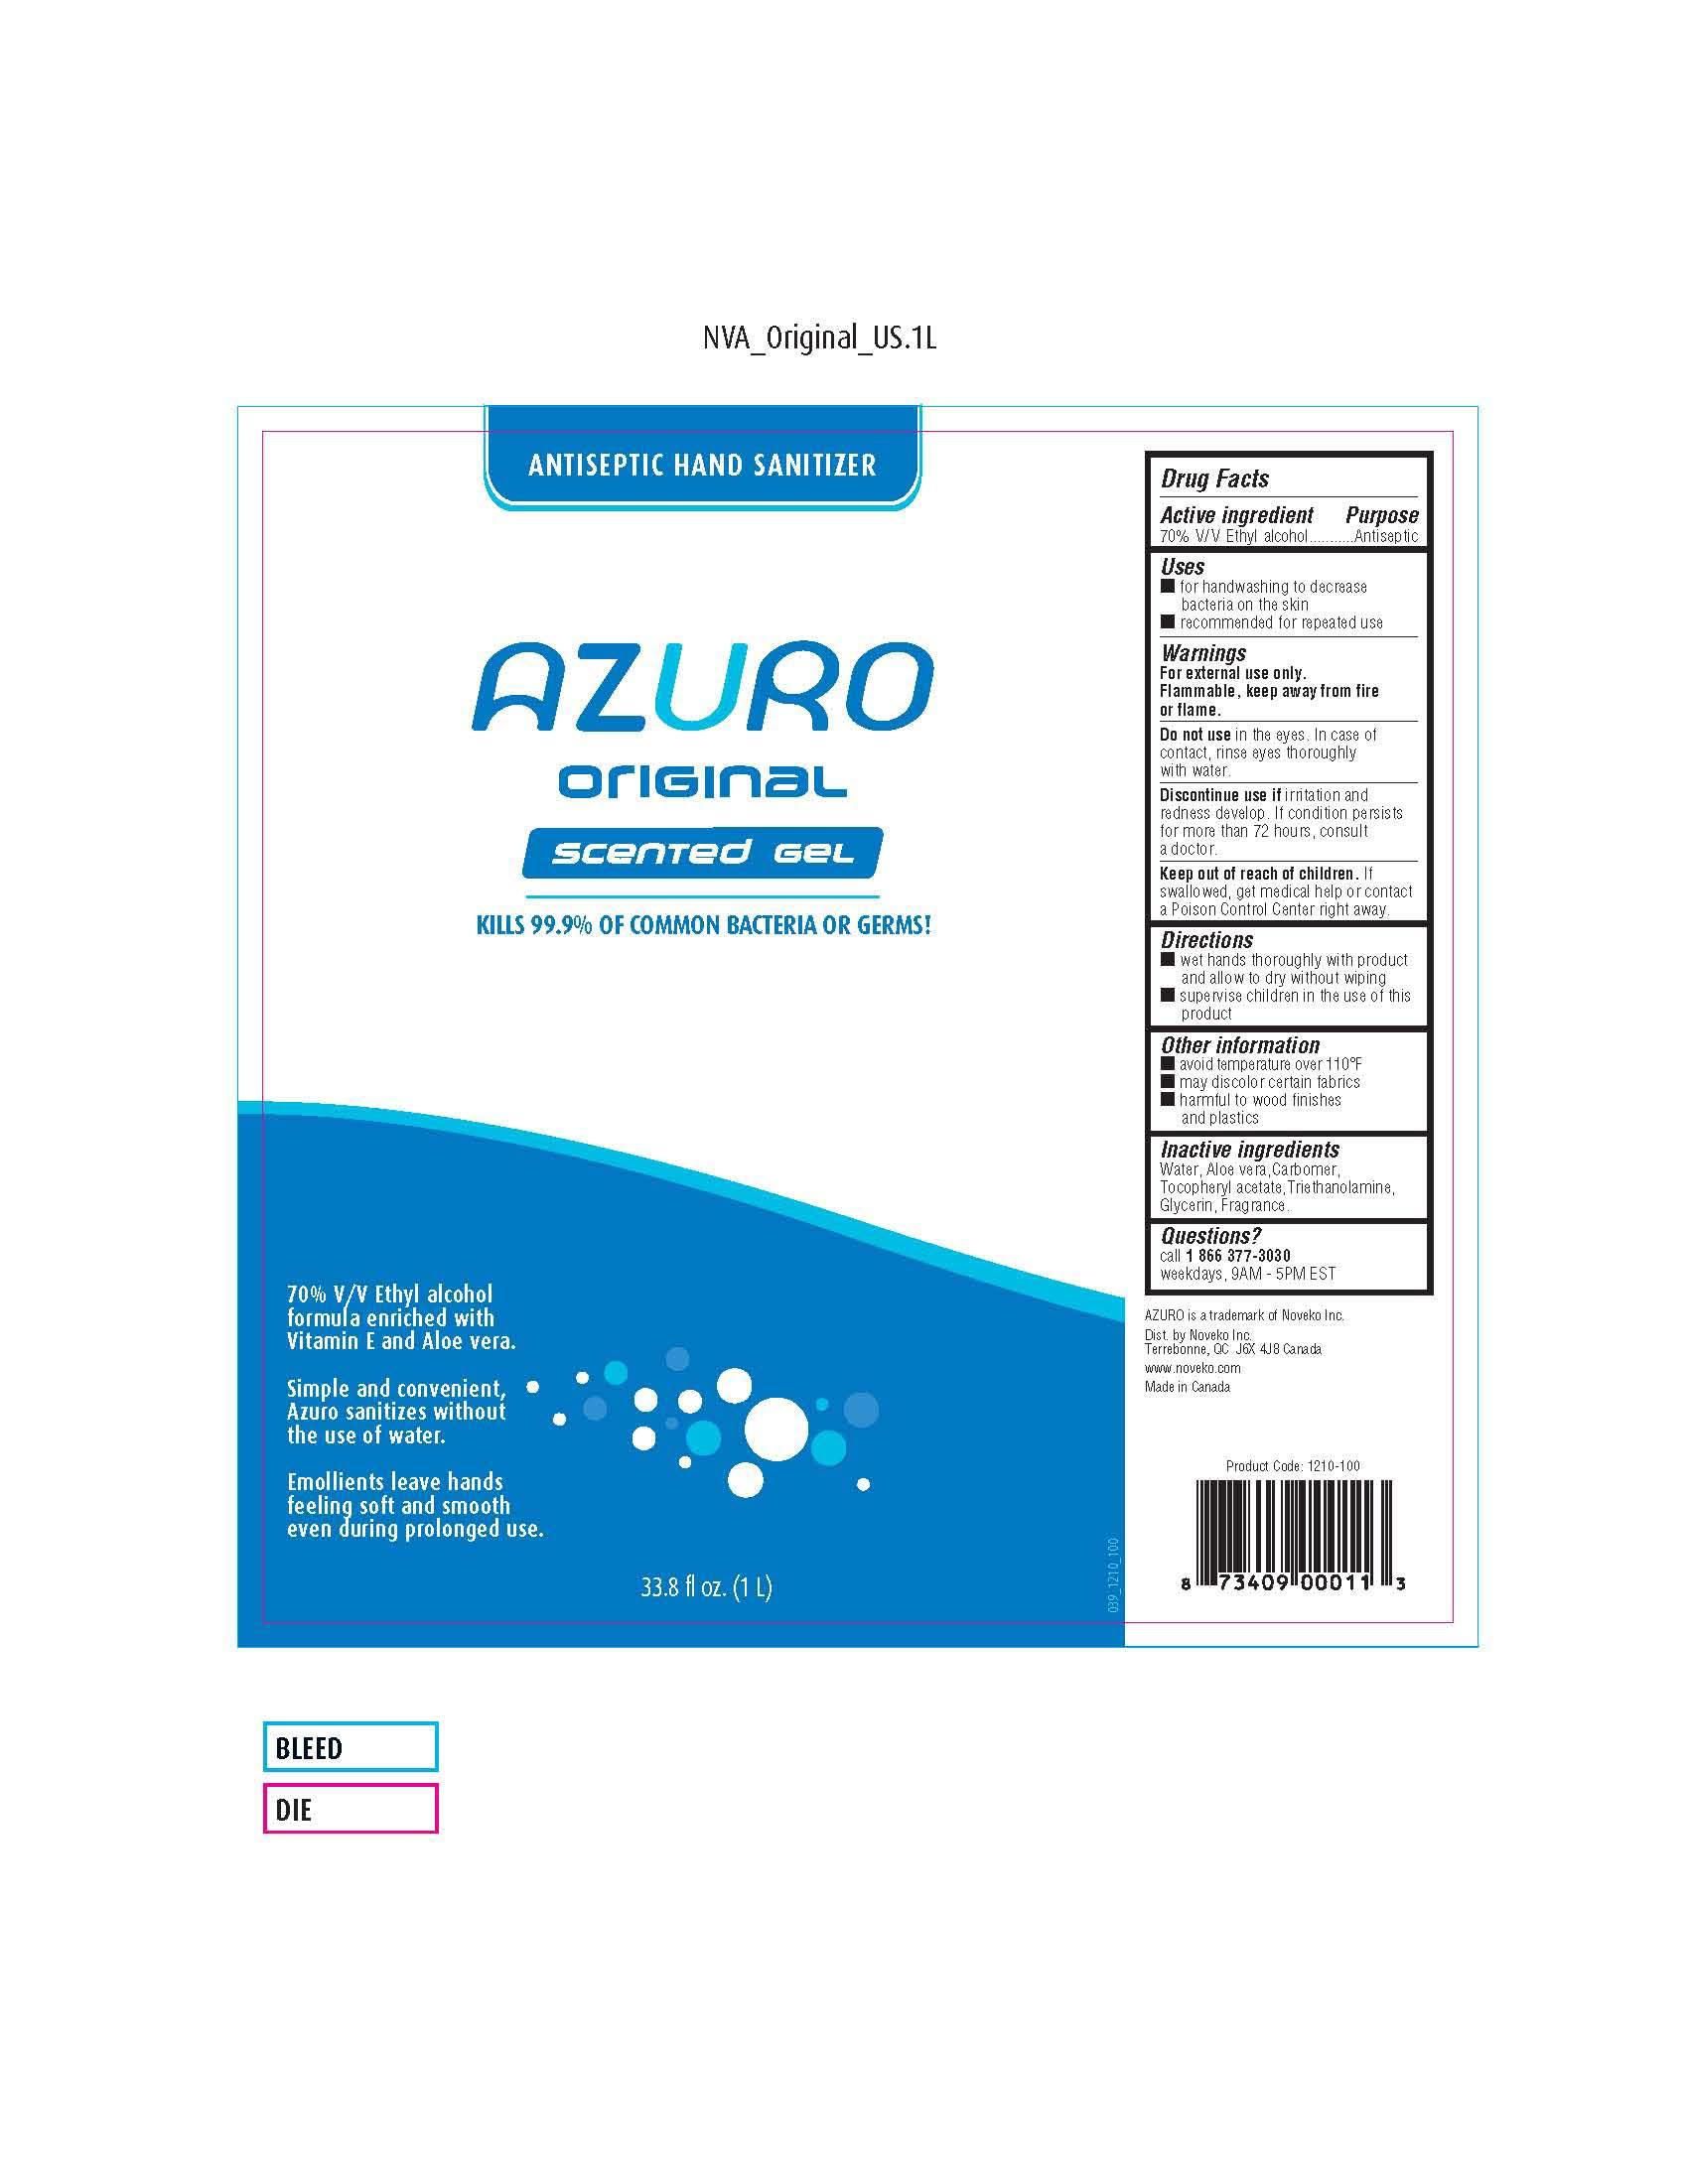 Azuro (Alcohol) Gel [Noveko Inc]